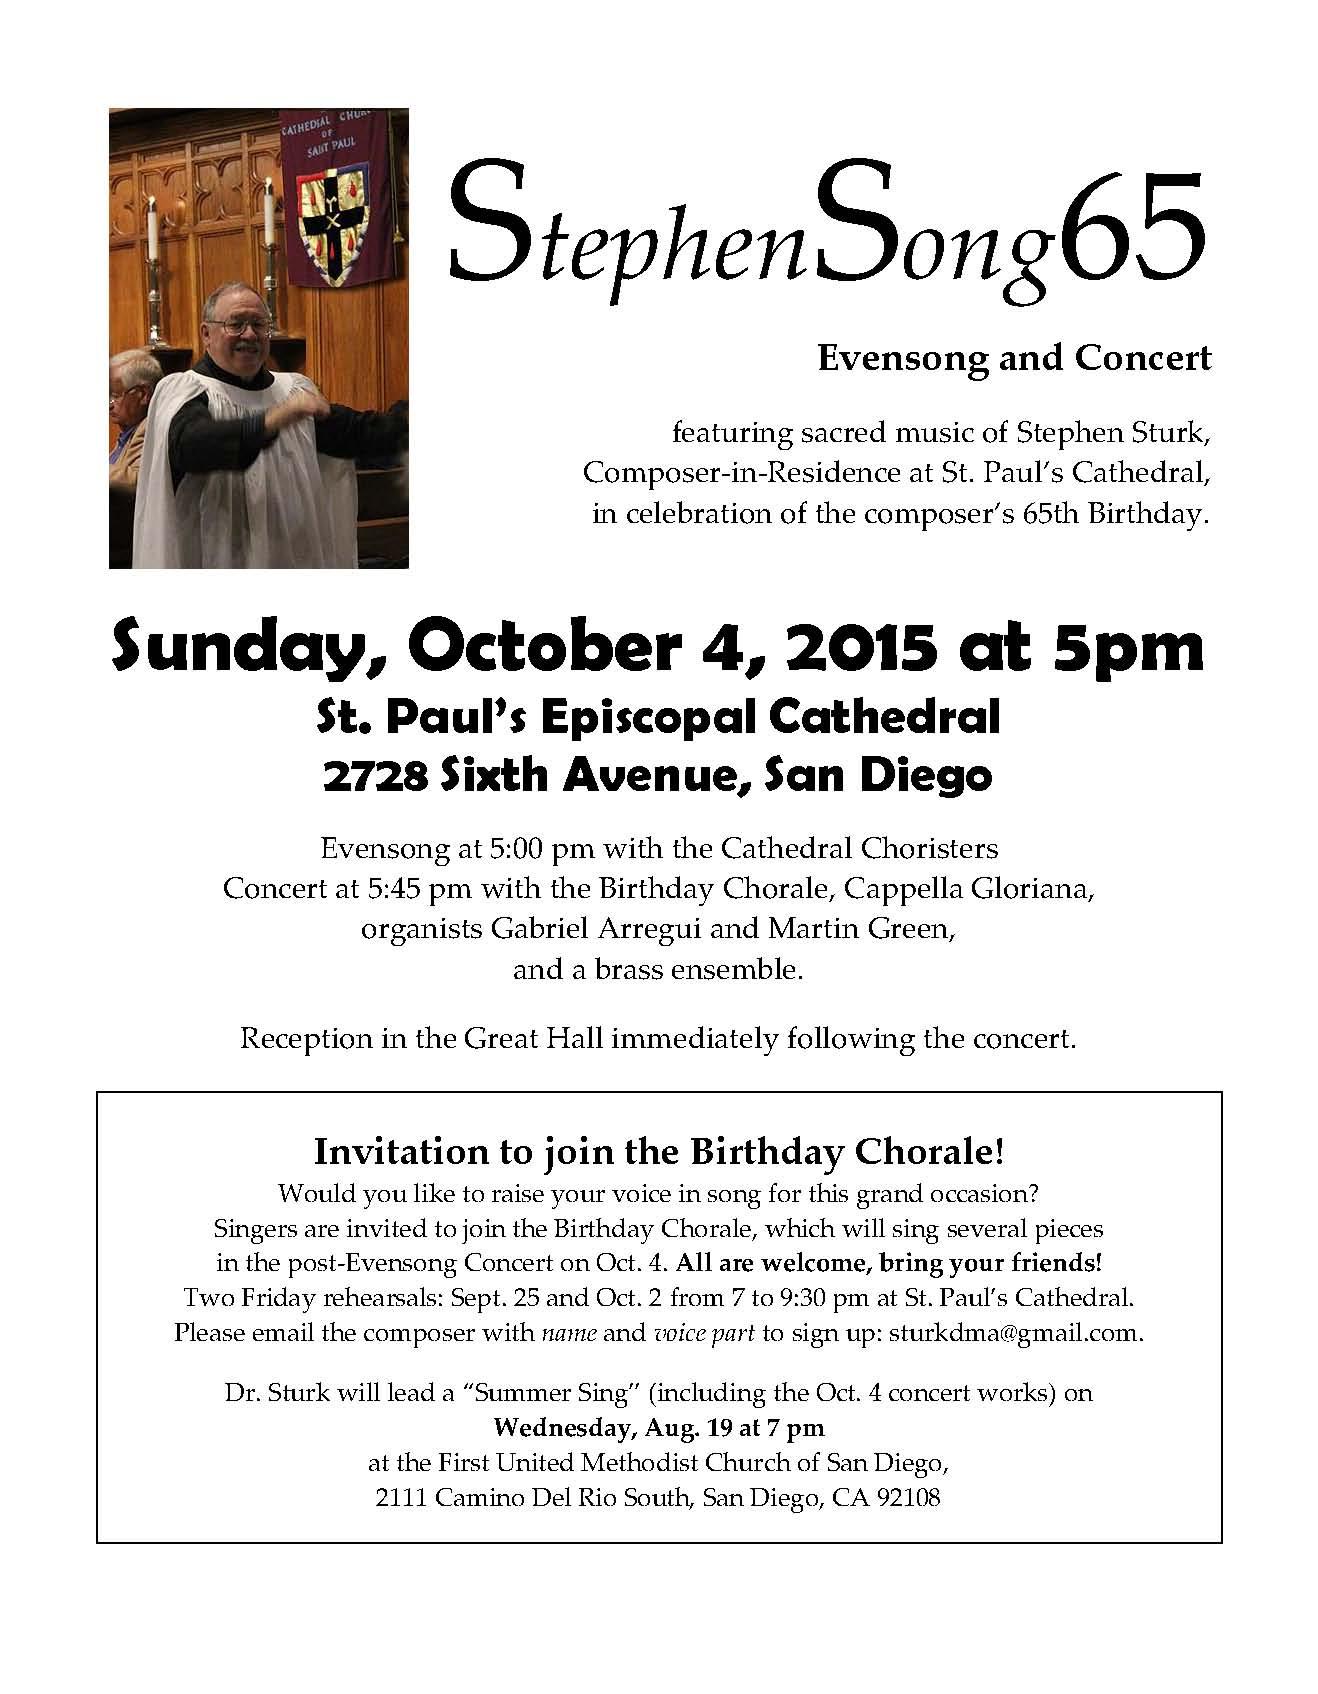 Stephen Sturk - Composer, Director, Musician